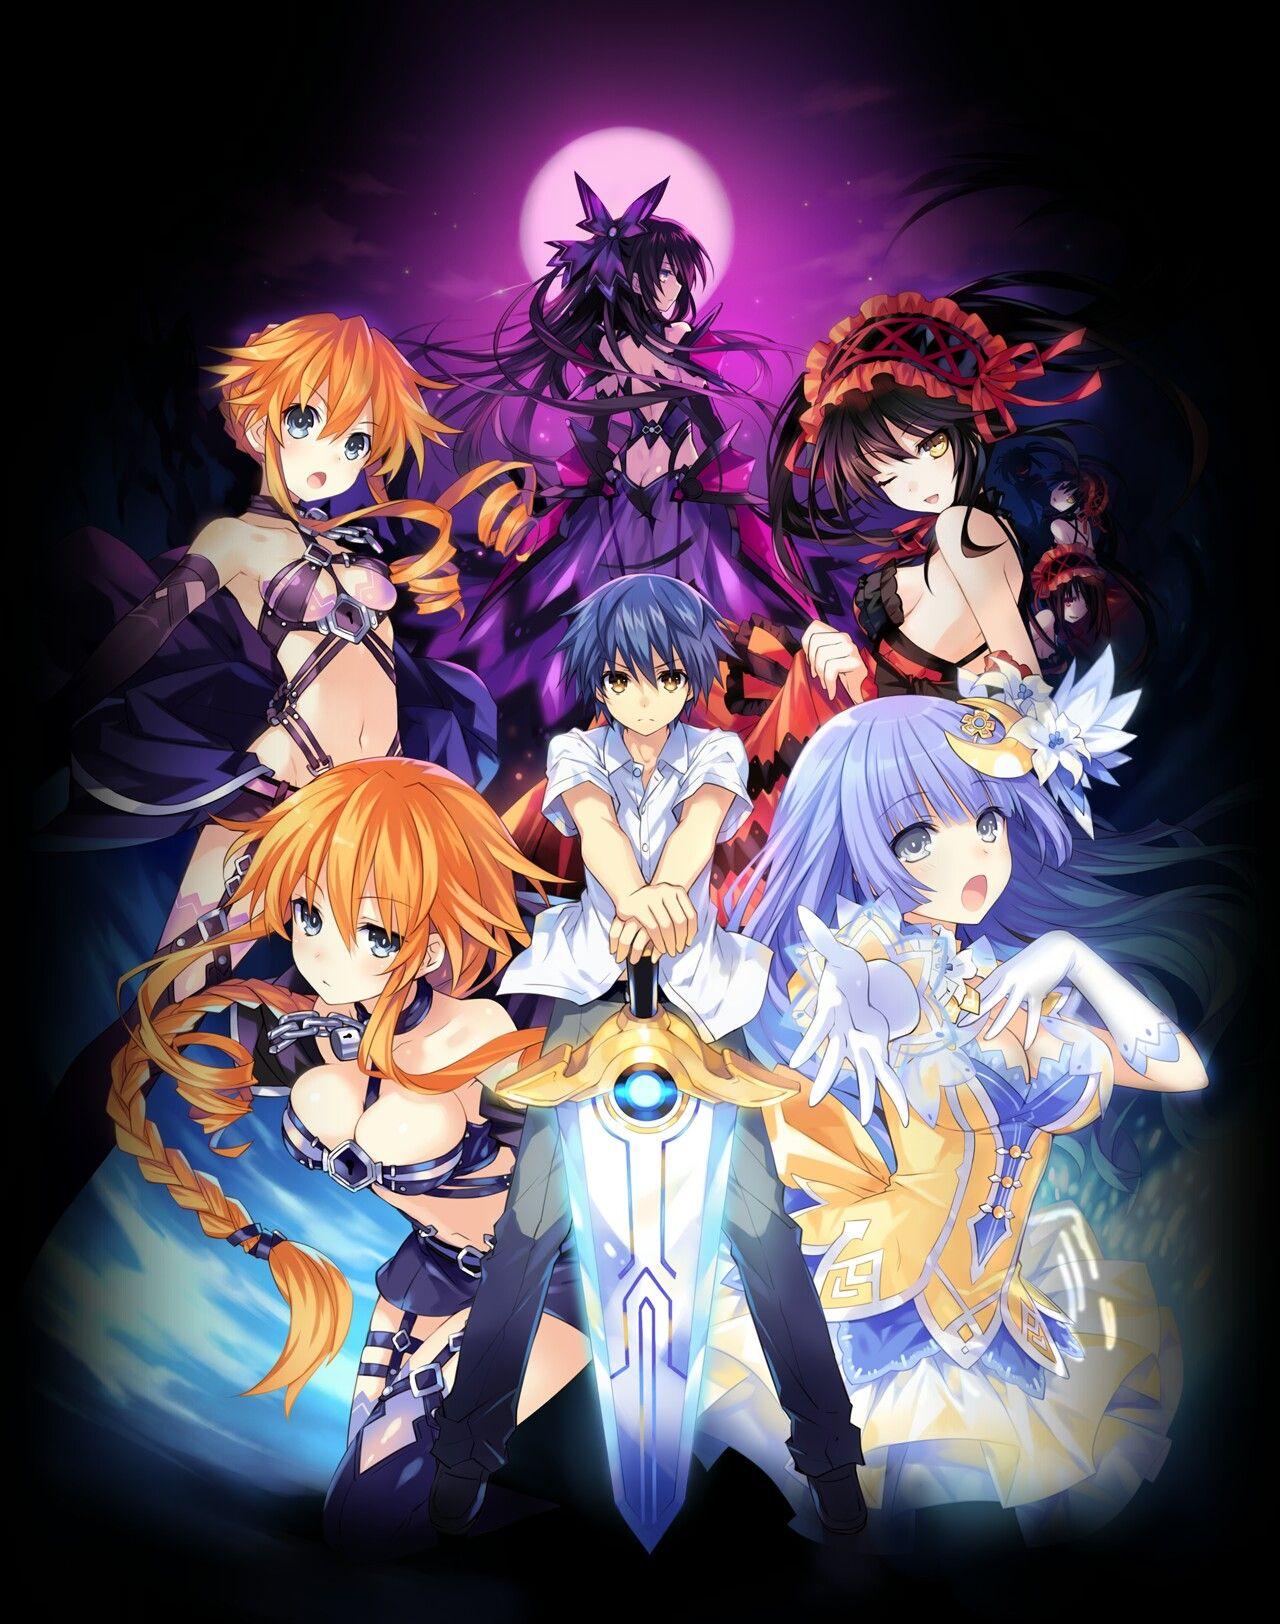 Date a Live project wallpaper // Top_vsl0501 Anime, Hình